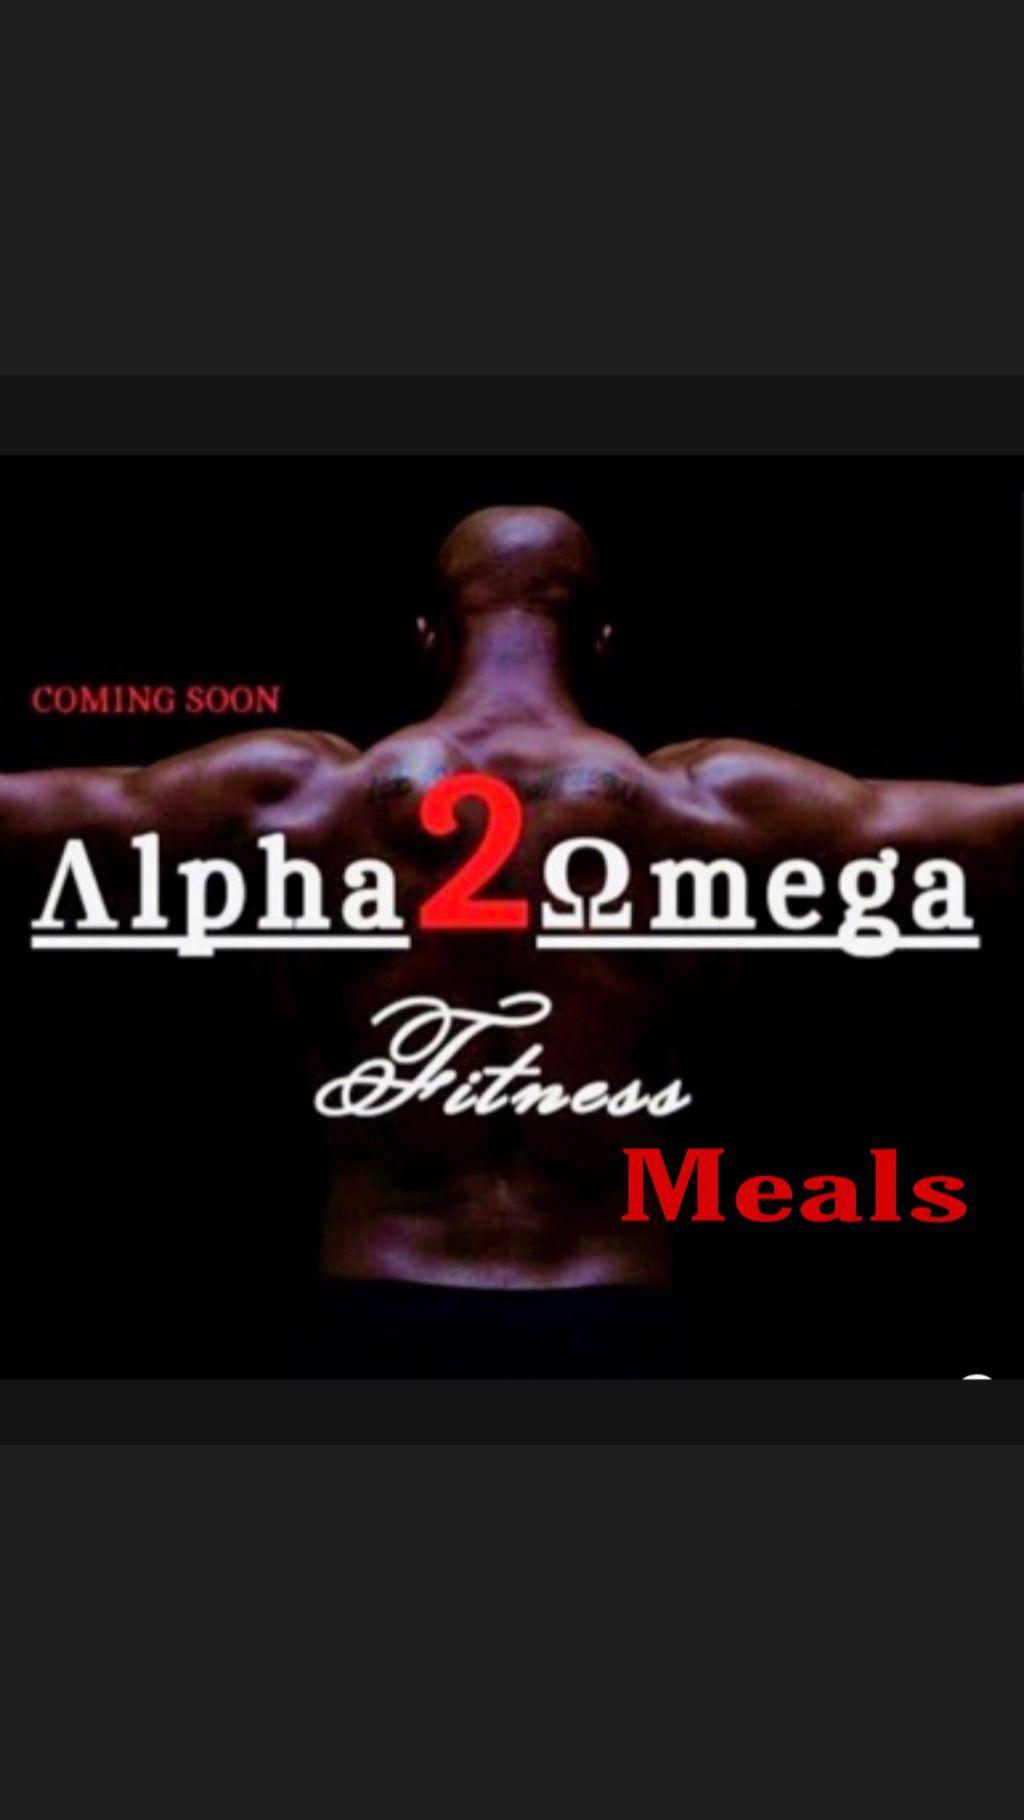 Alpha2Omega Fitness L.L.C